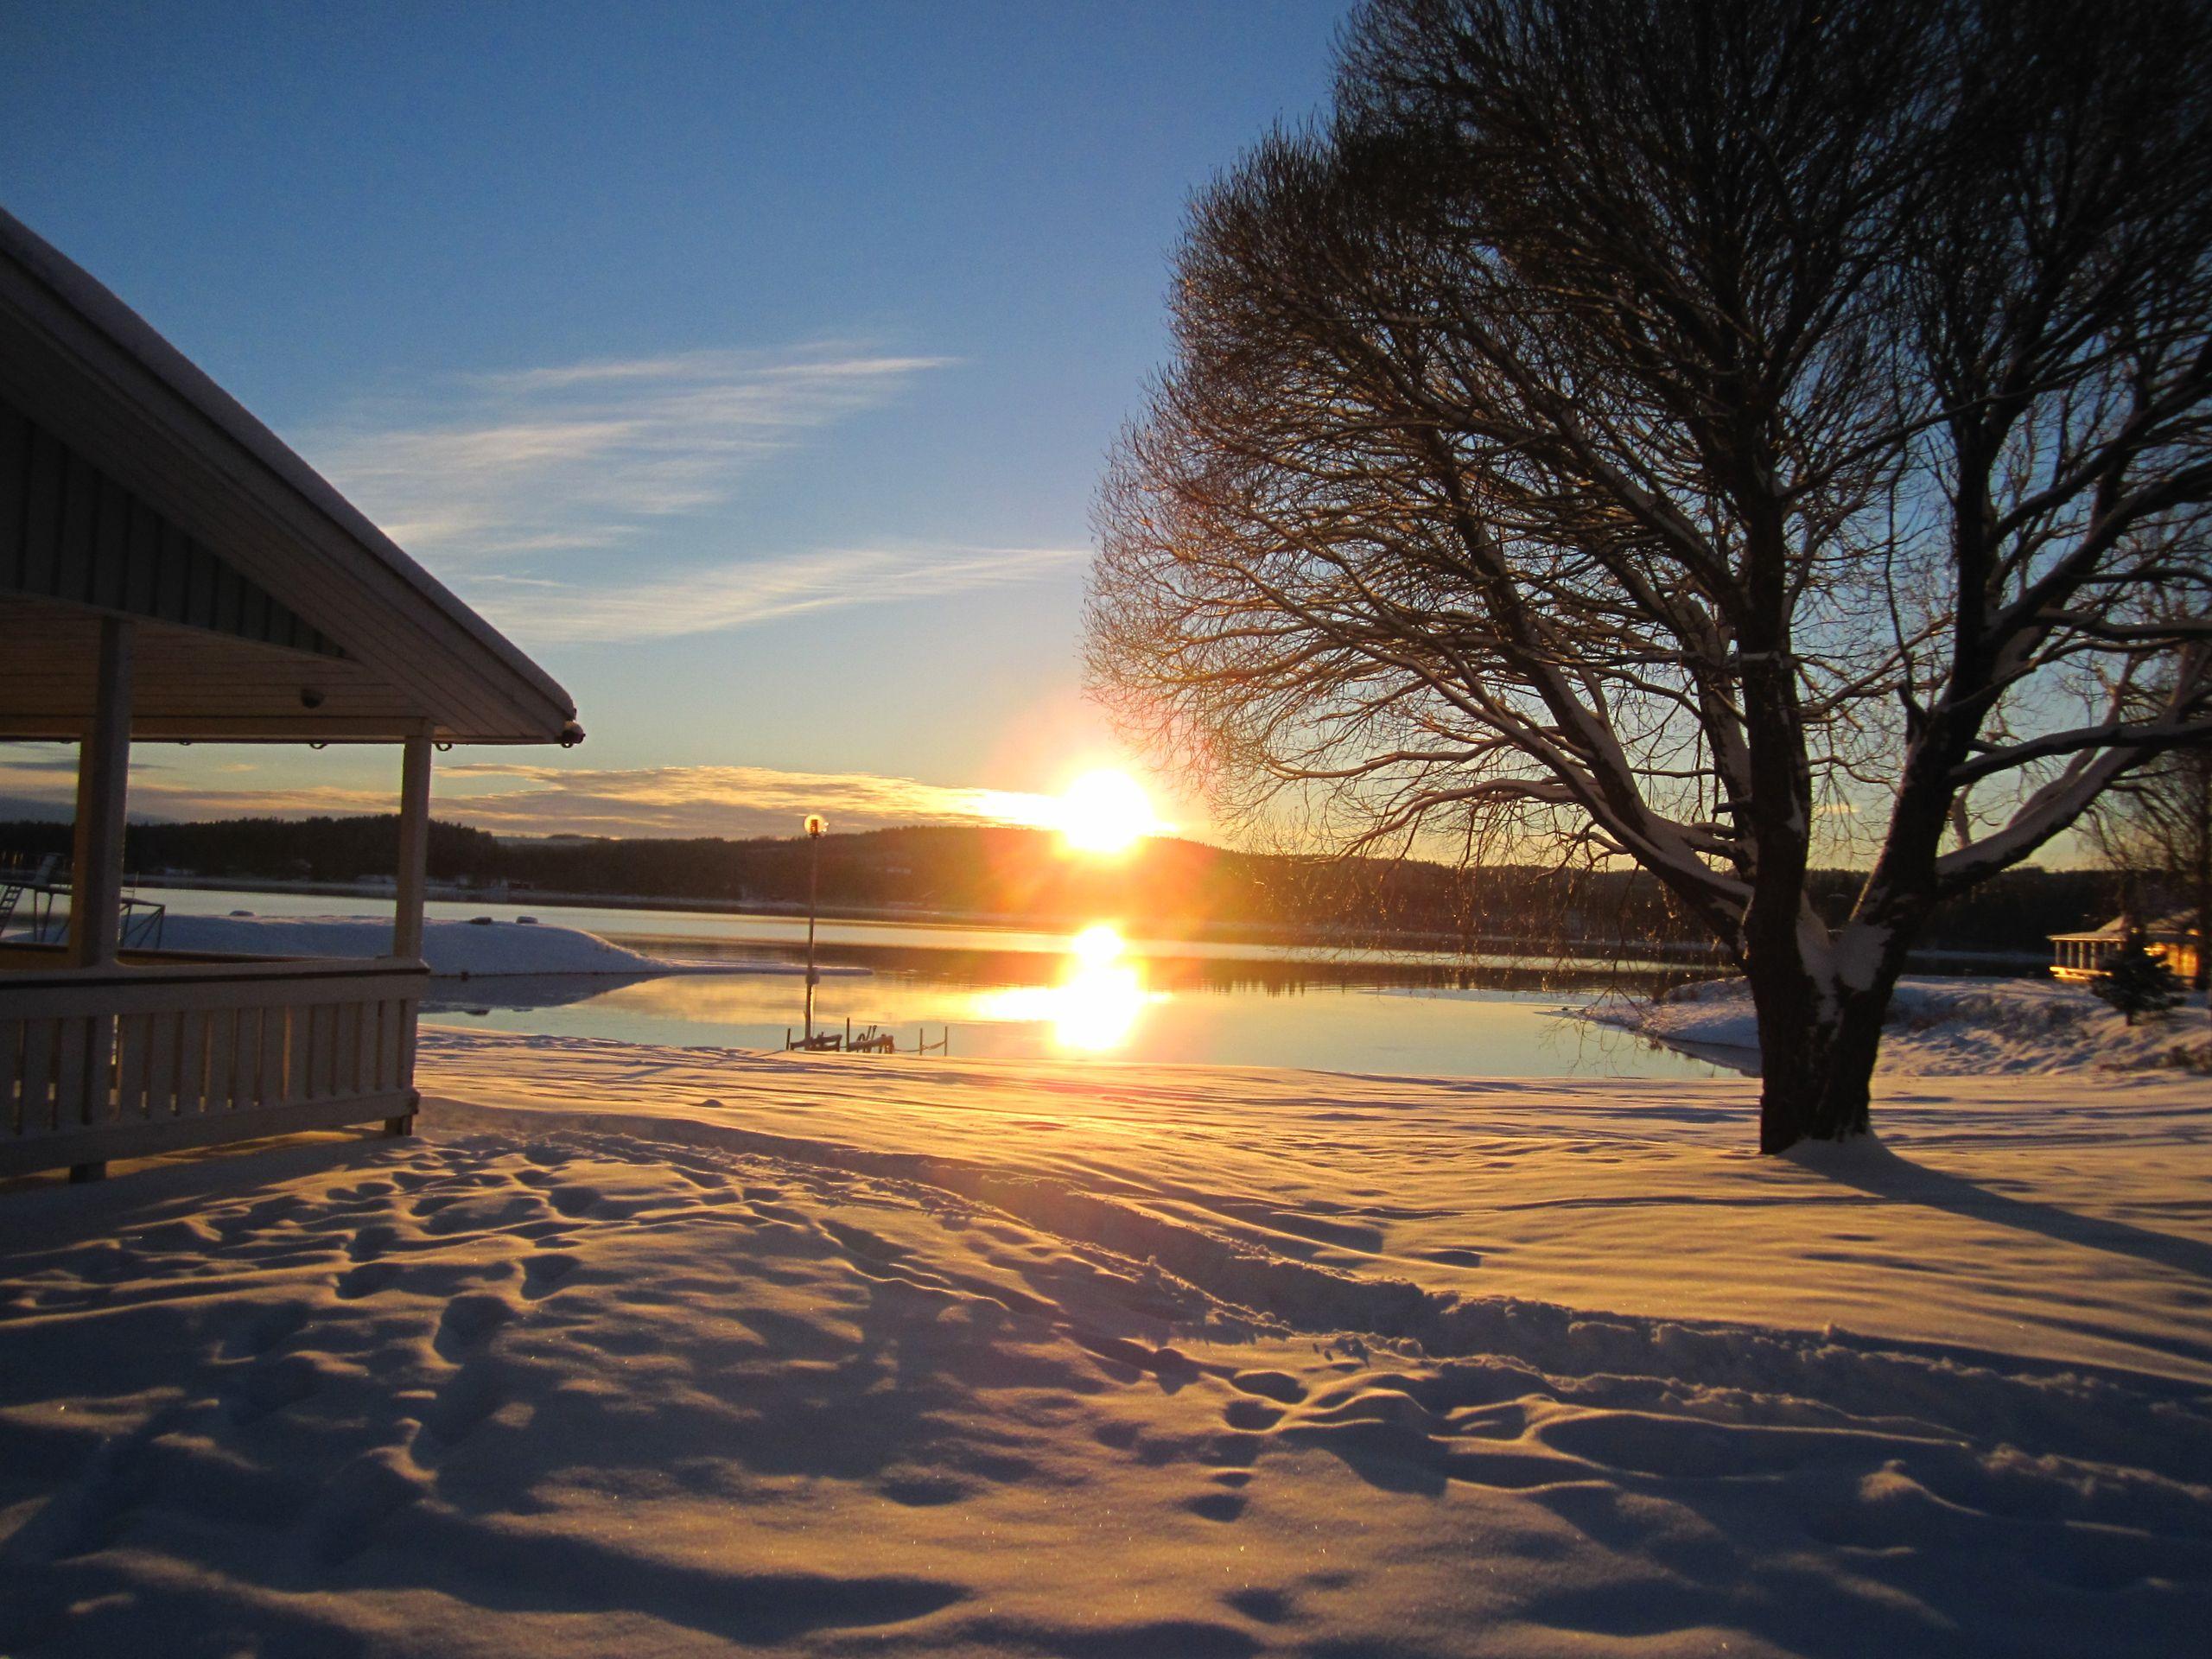 snow-came-pielisen-karjala-north-karelia-finland.jpg